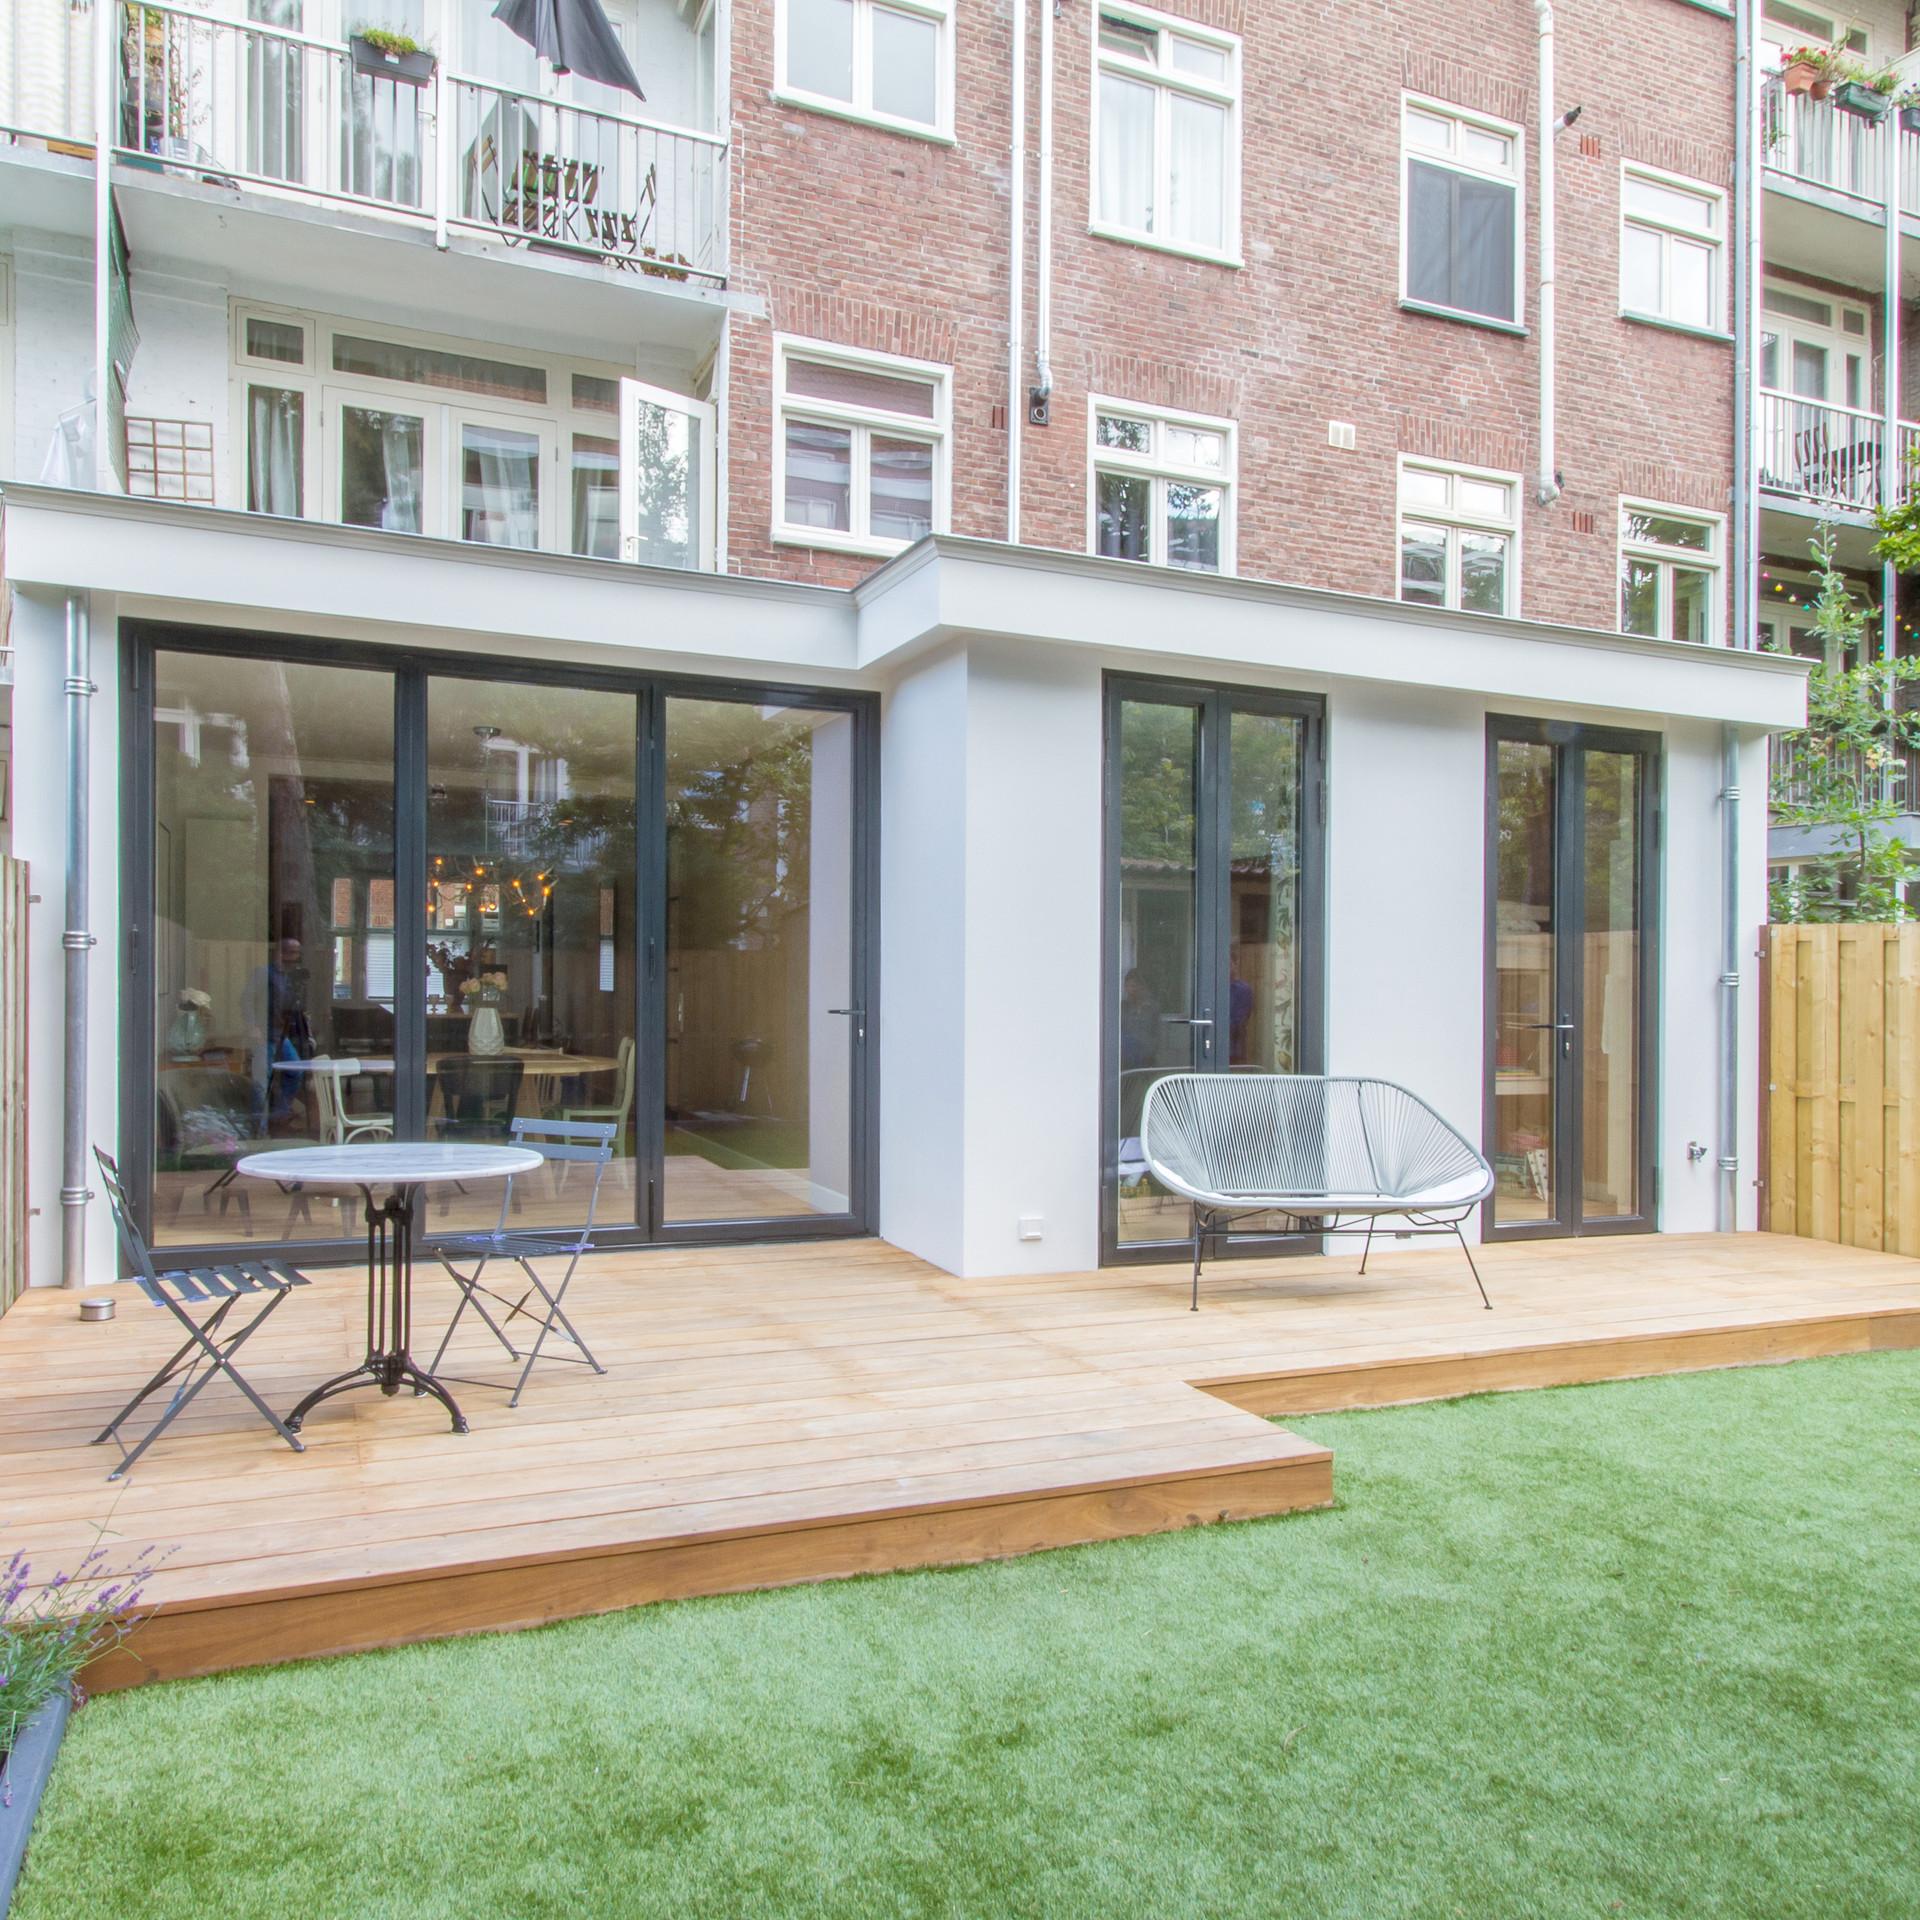 JasperGroolArchitect-Roerstraat-IMG_1431